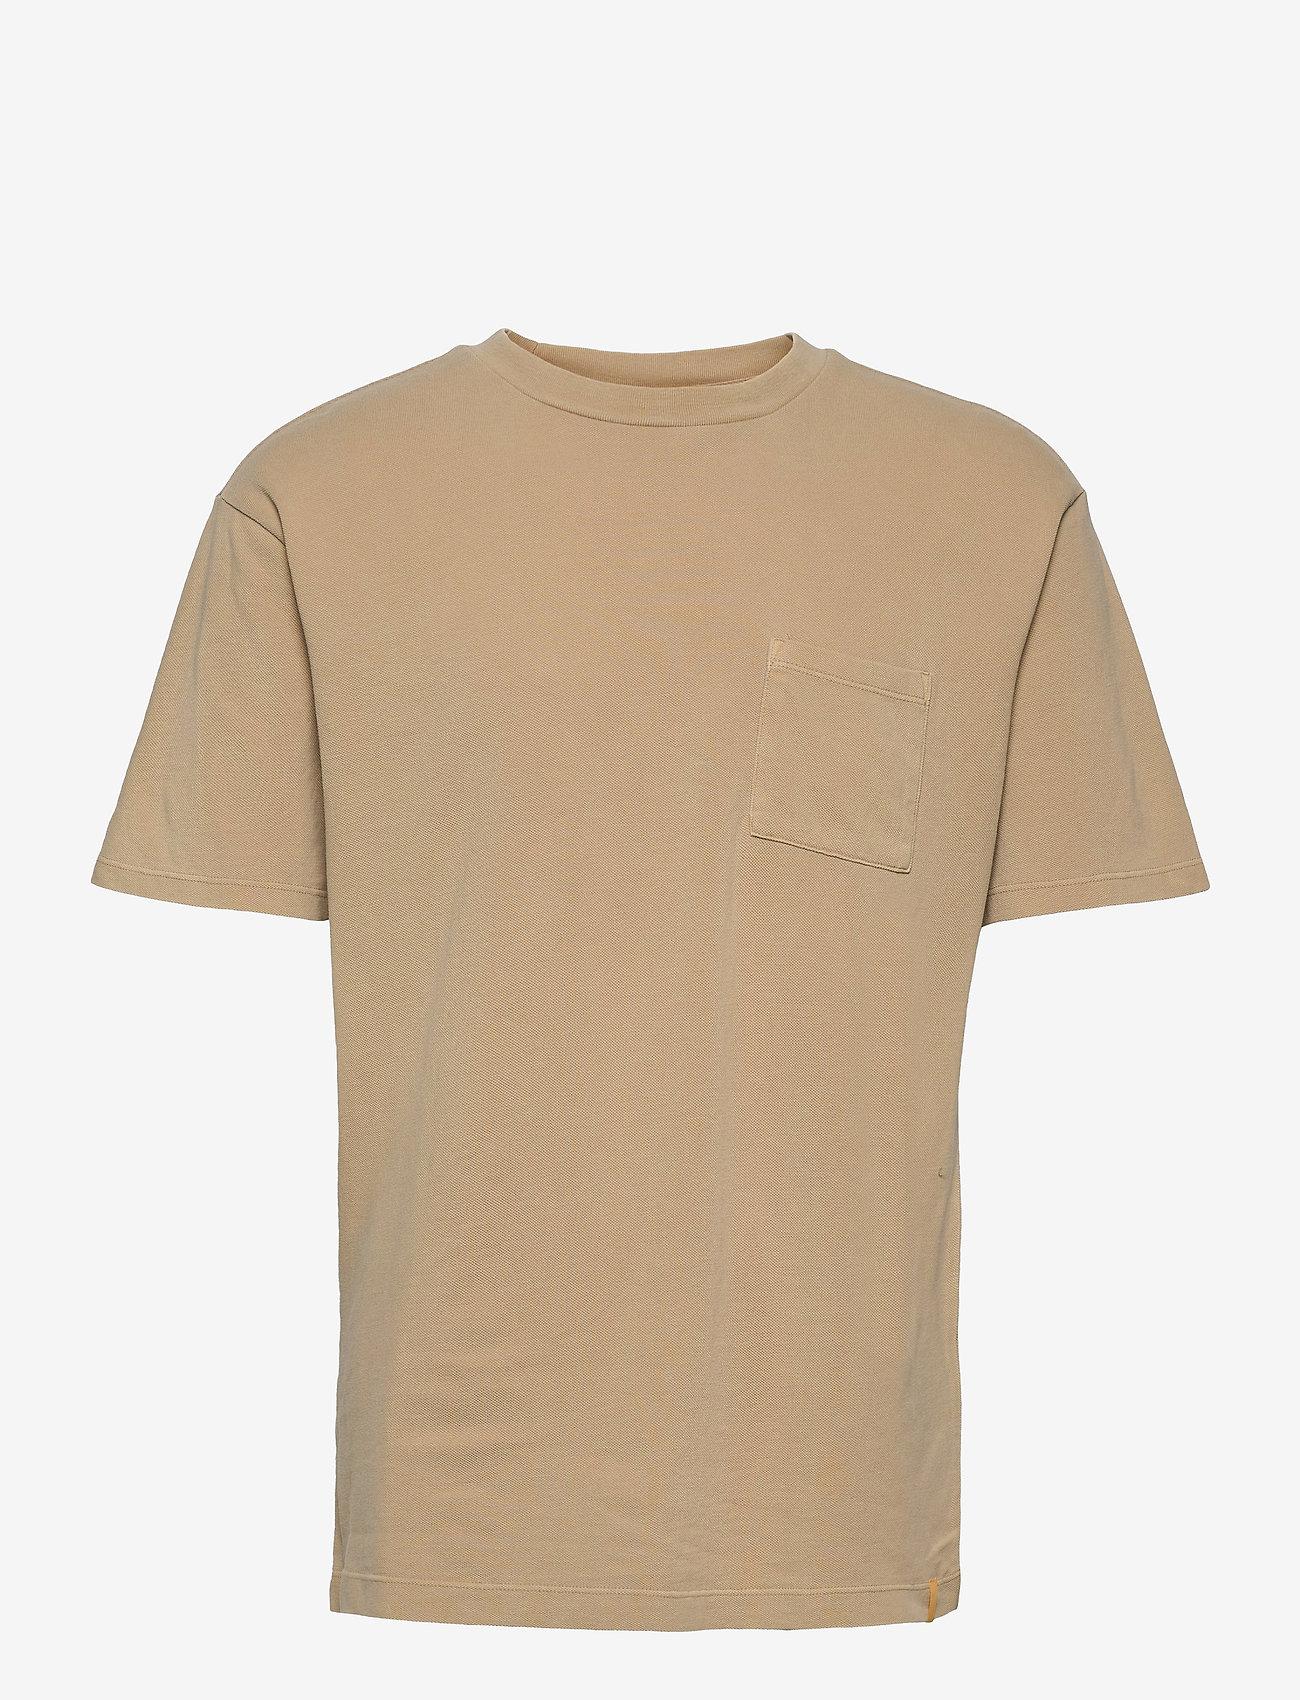 Scotch & Soda - Organic cotton garment-dyed pique crewneck t-shirt - podstawowe koszulki - sand - 0